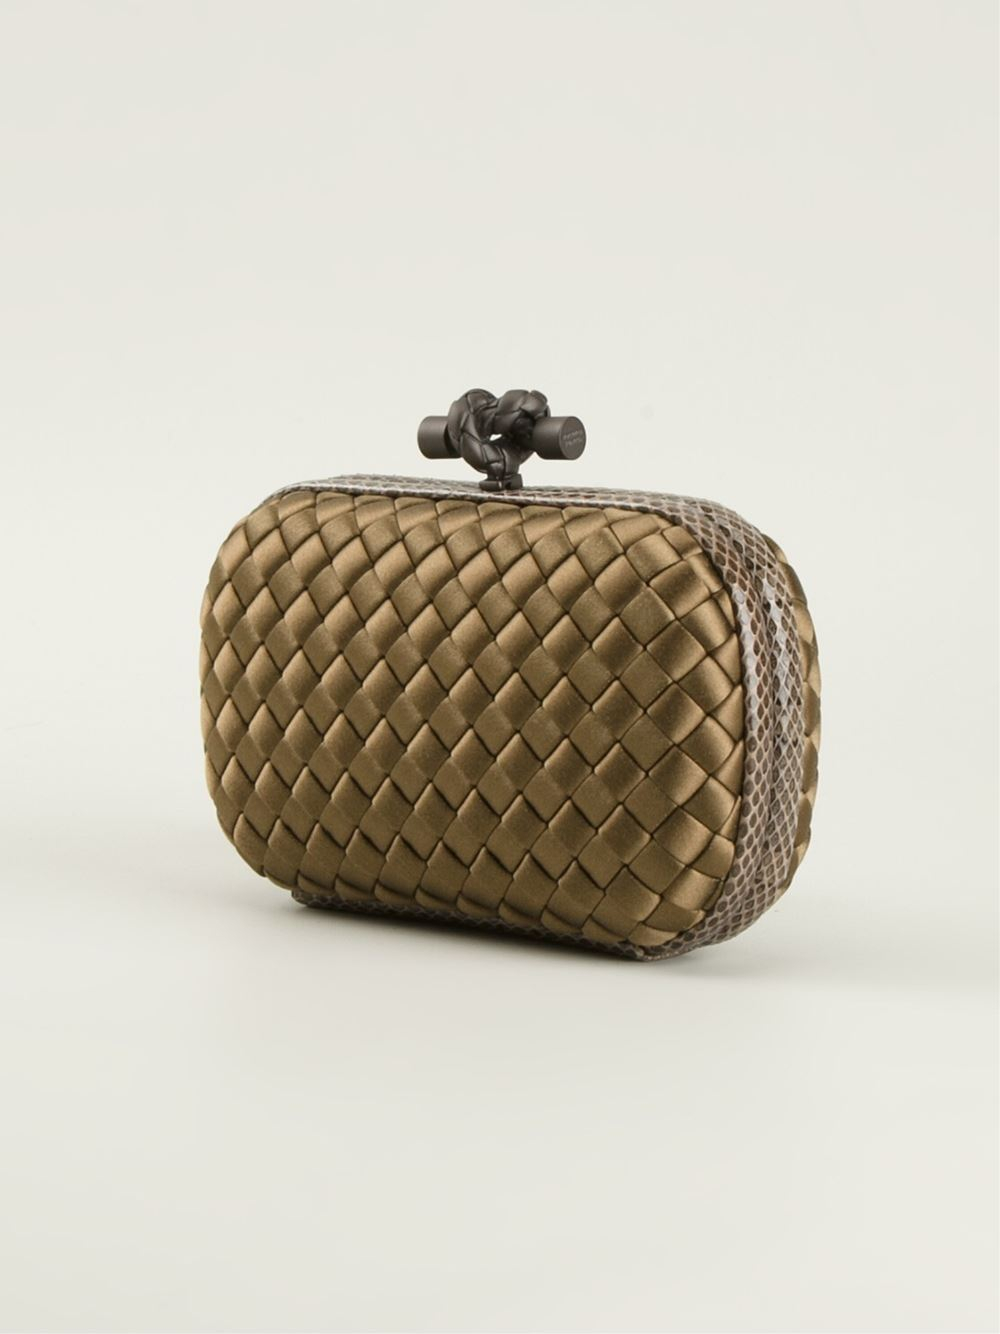 lyst bottega veneta 39 knot 39 box clutch in brown. Black Bedroom Furniture Sets. Home Design Ideas